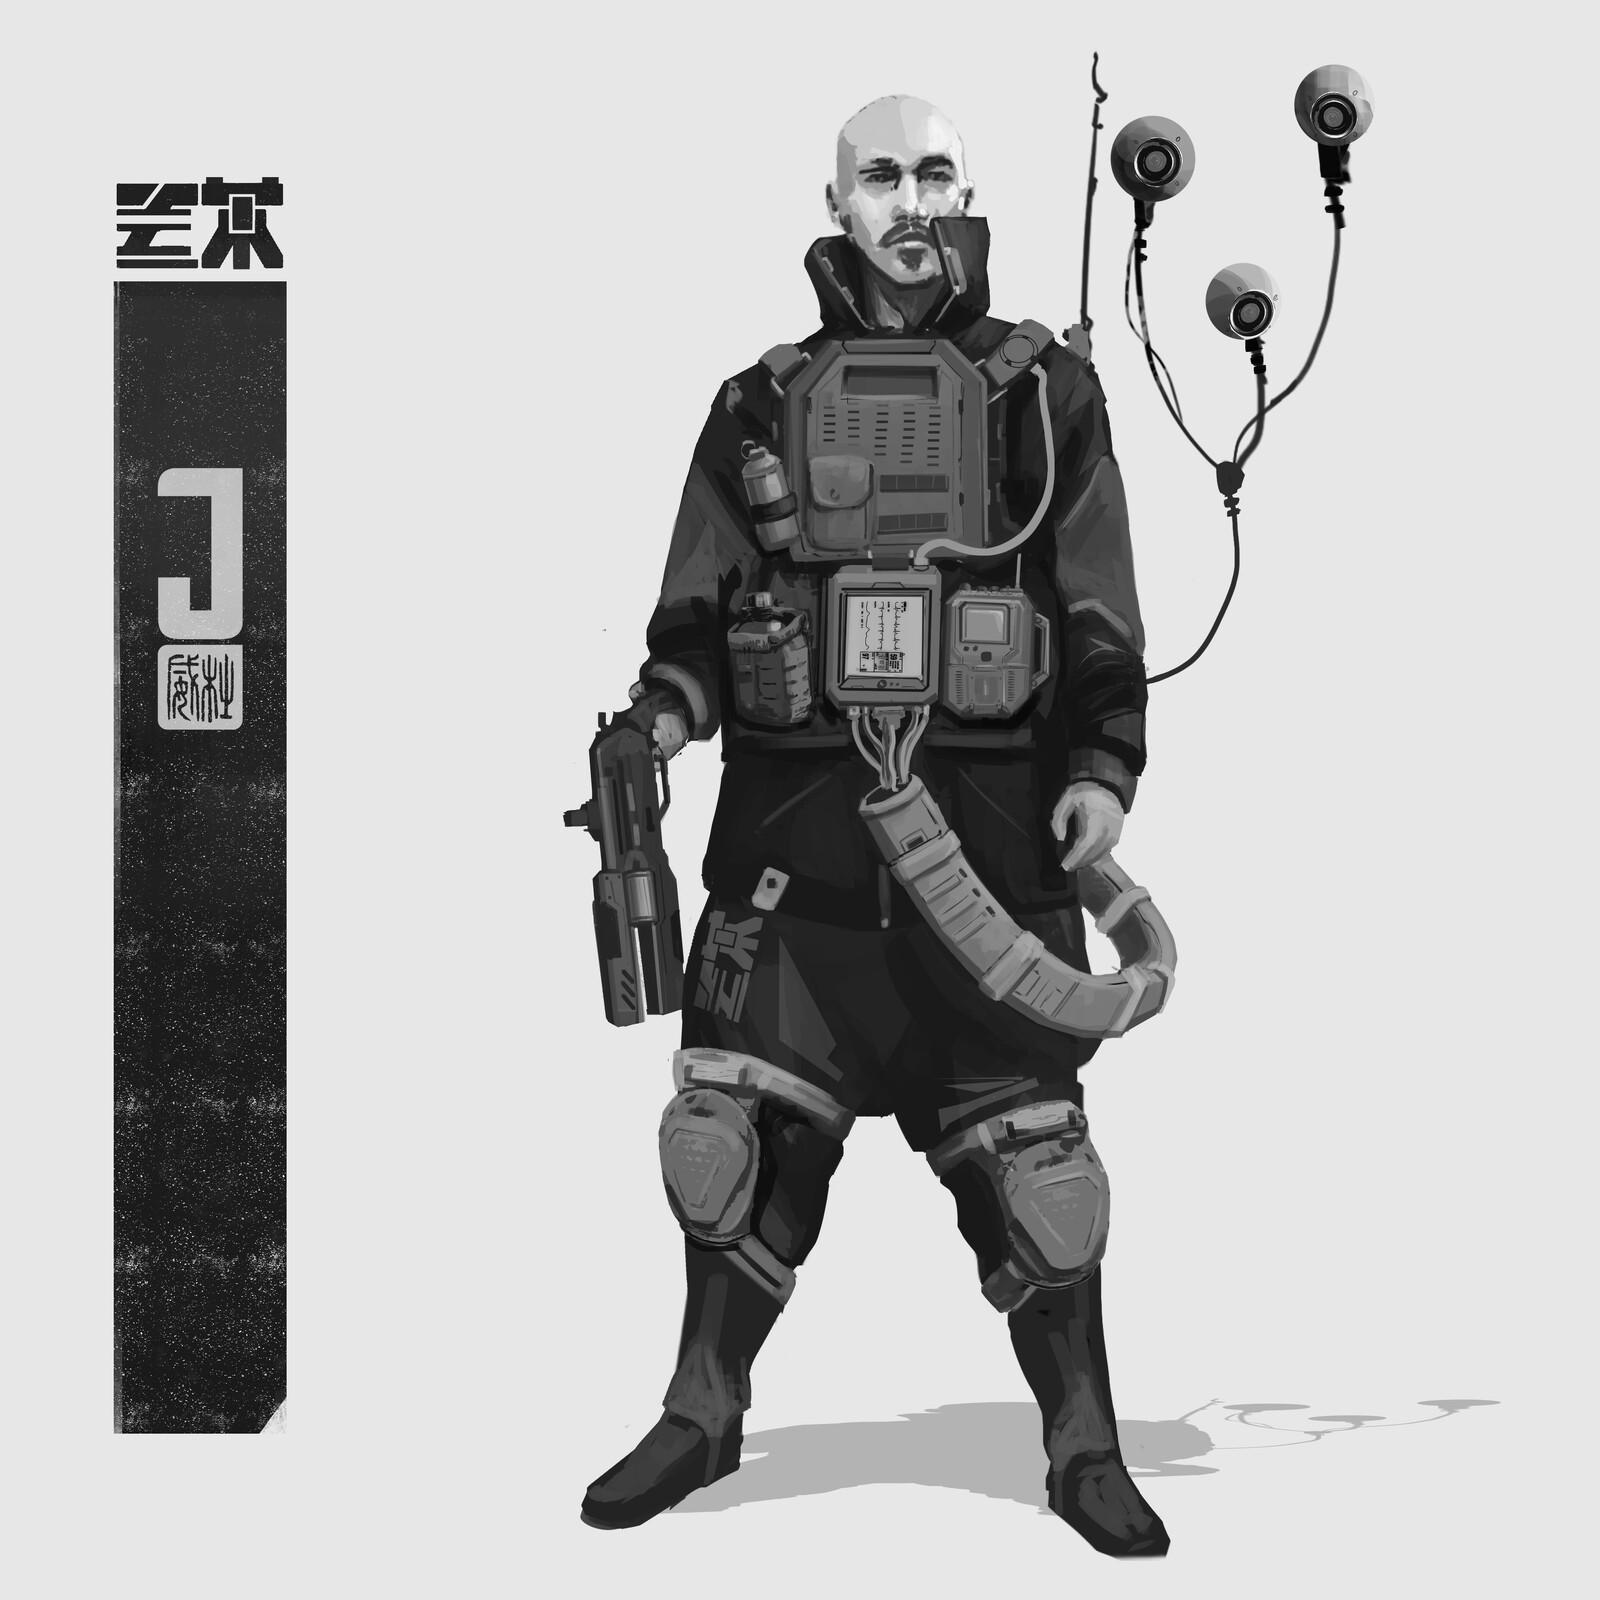 Cyber sketch